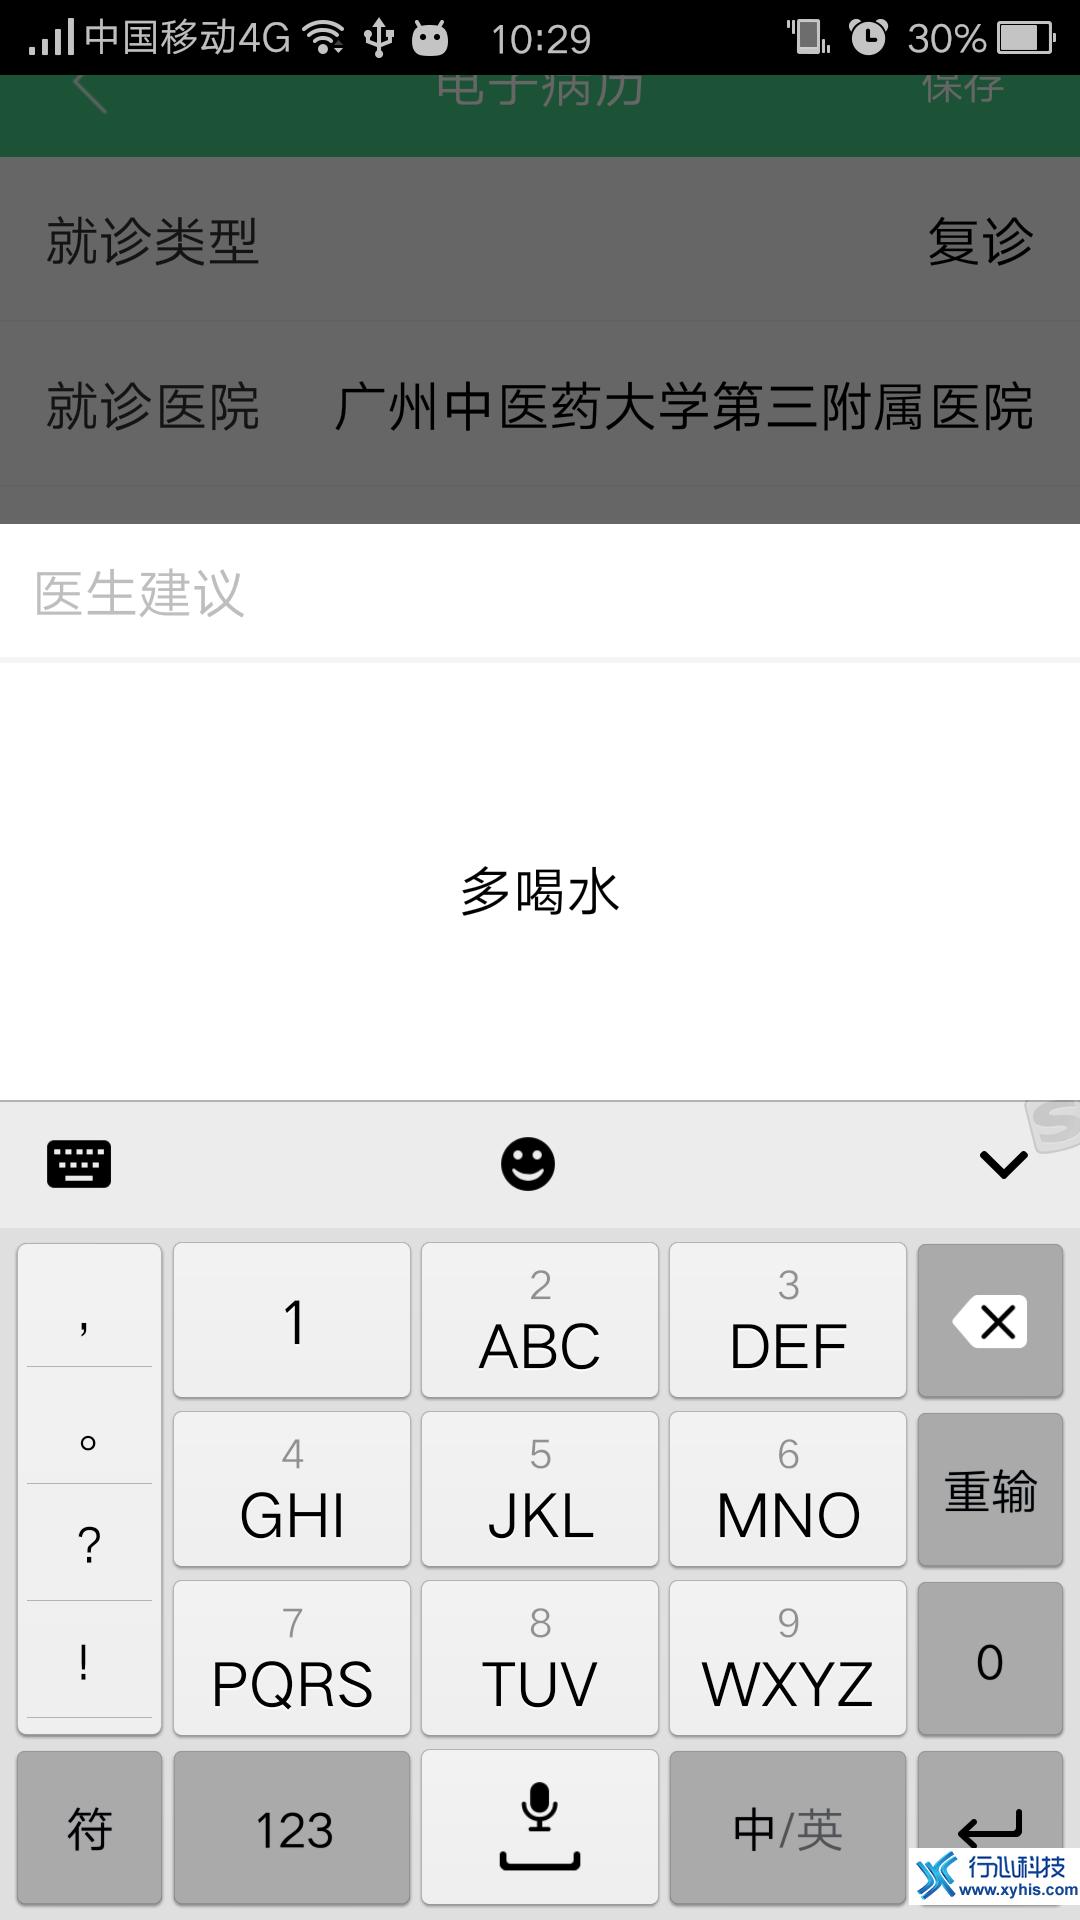 Screenshot_2016-06-24-10-29-00-189.png